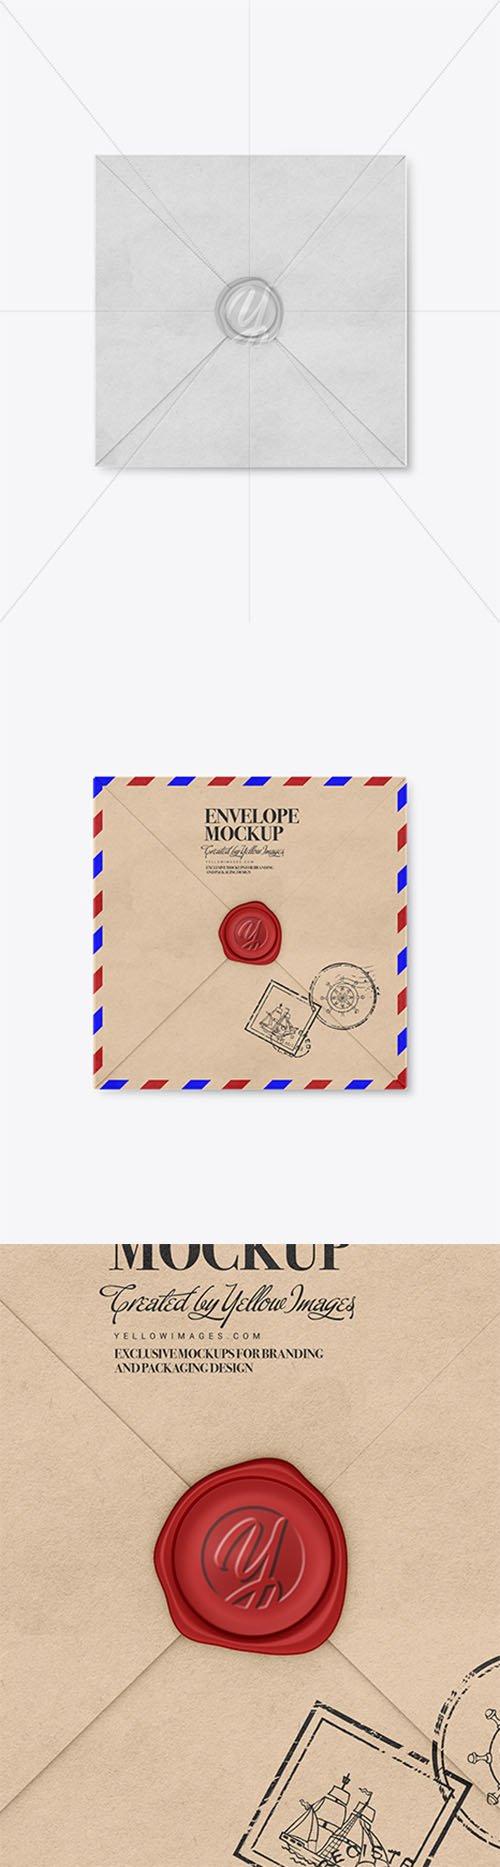 Kraft Paper Envelope with Wax Mockup 37415 TIF